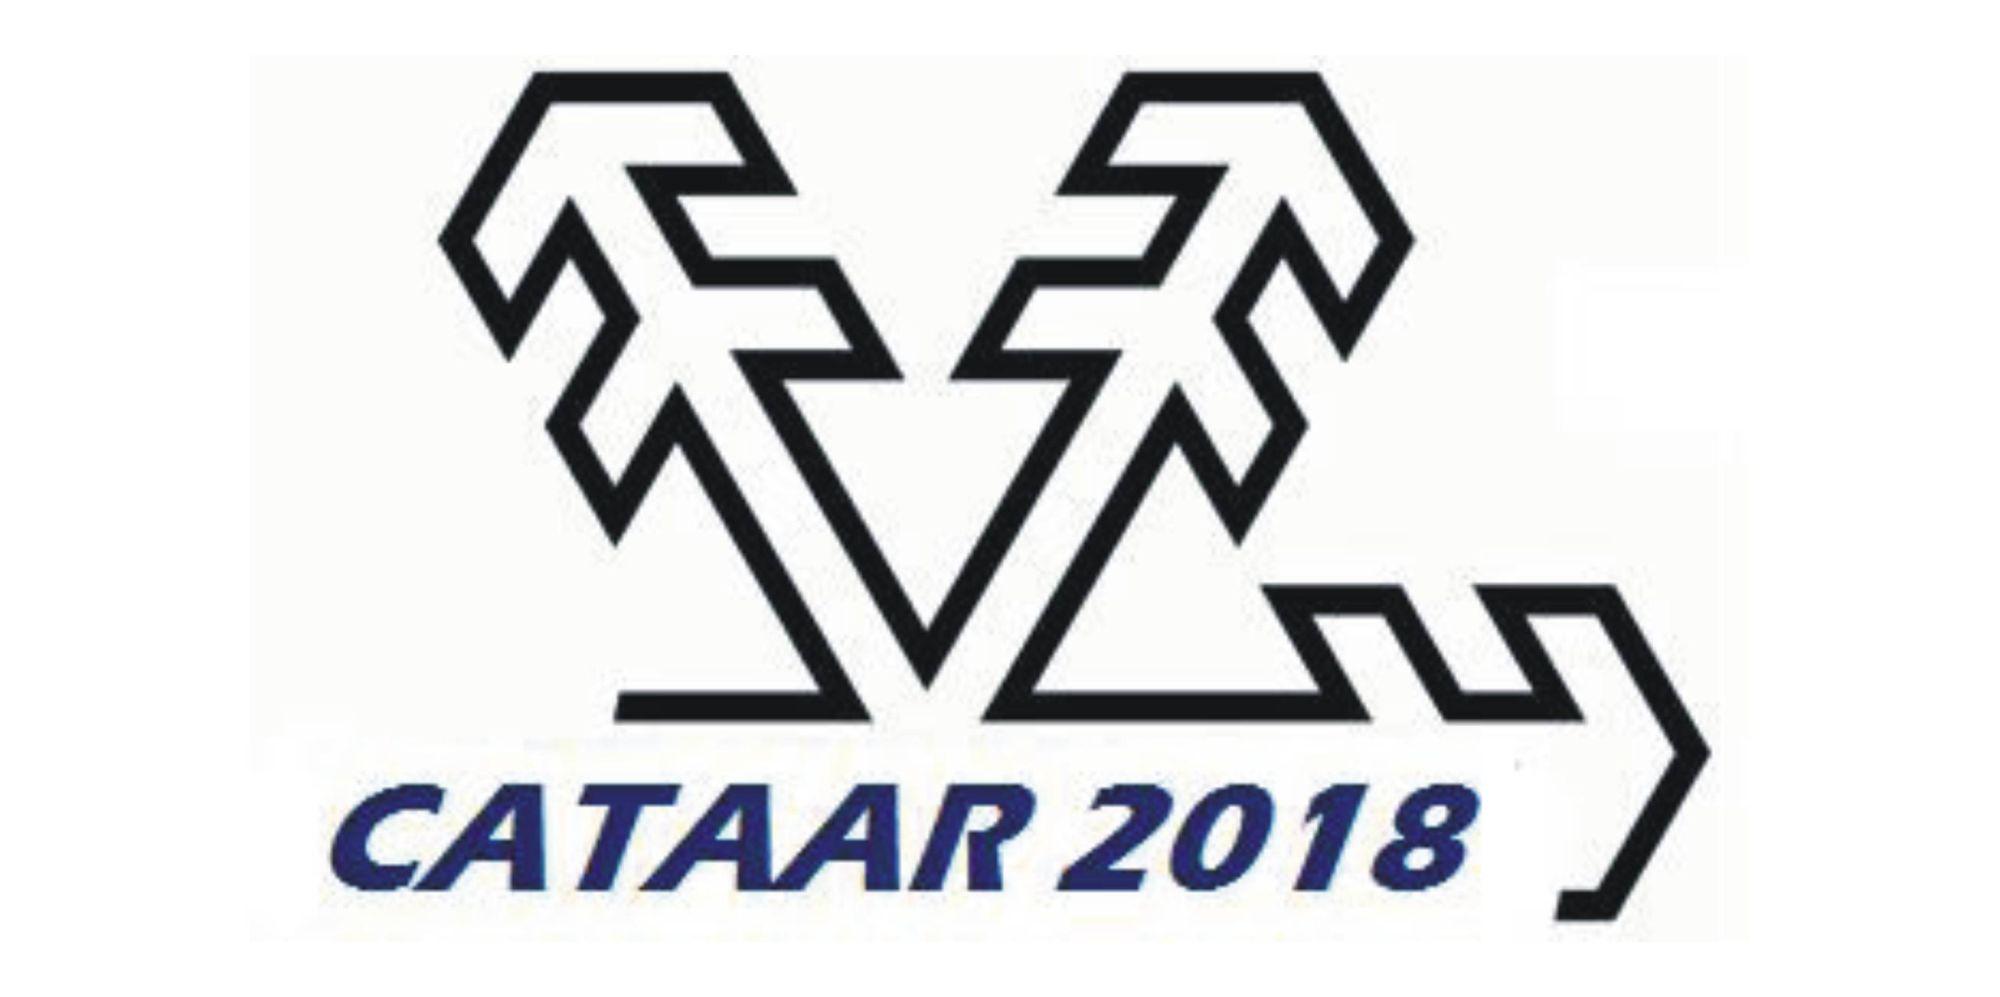 Testo en Cataar Nacional 2018